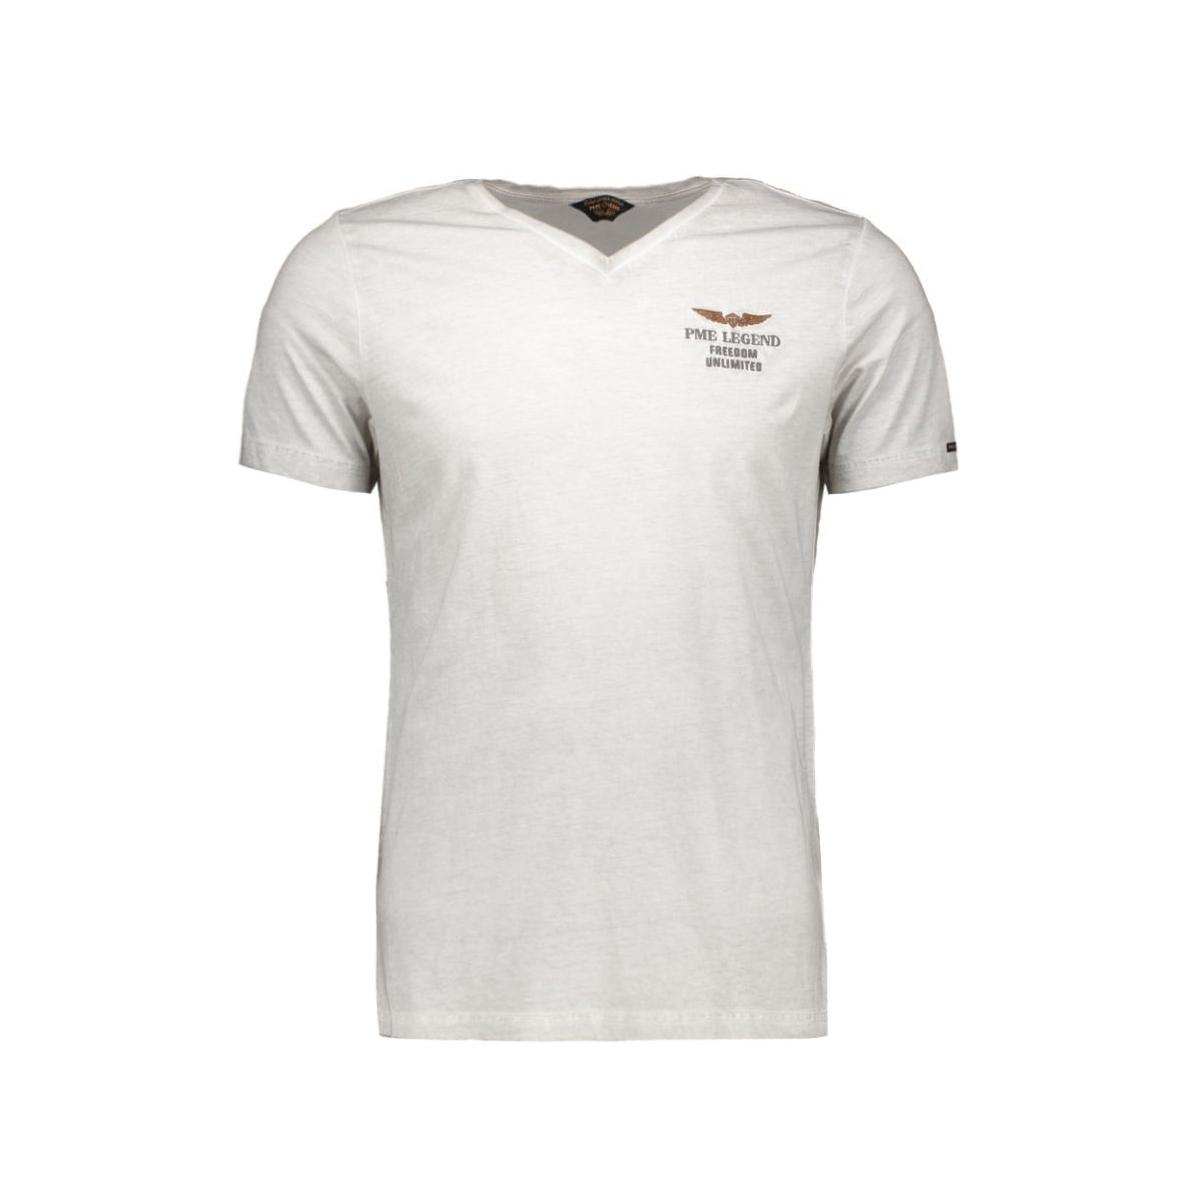 ptss65524 pme legend t-shirt 926